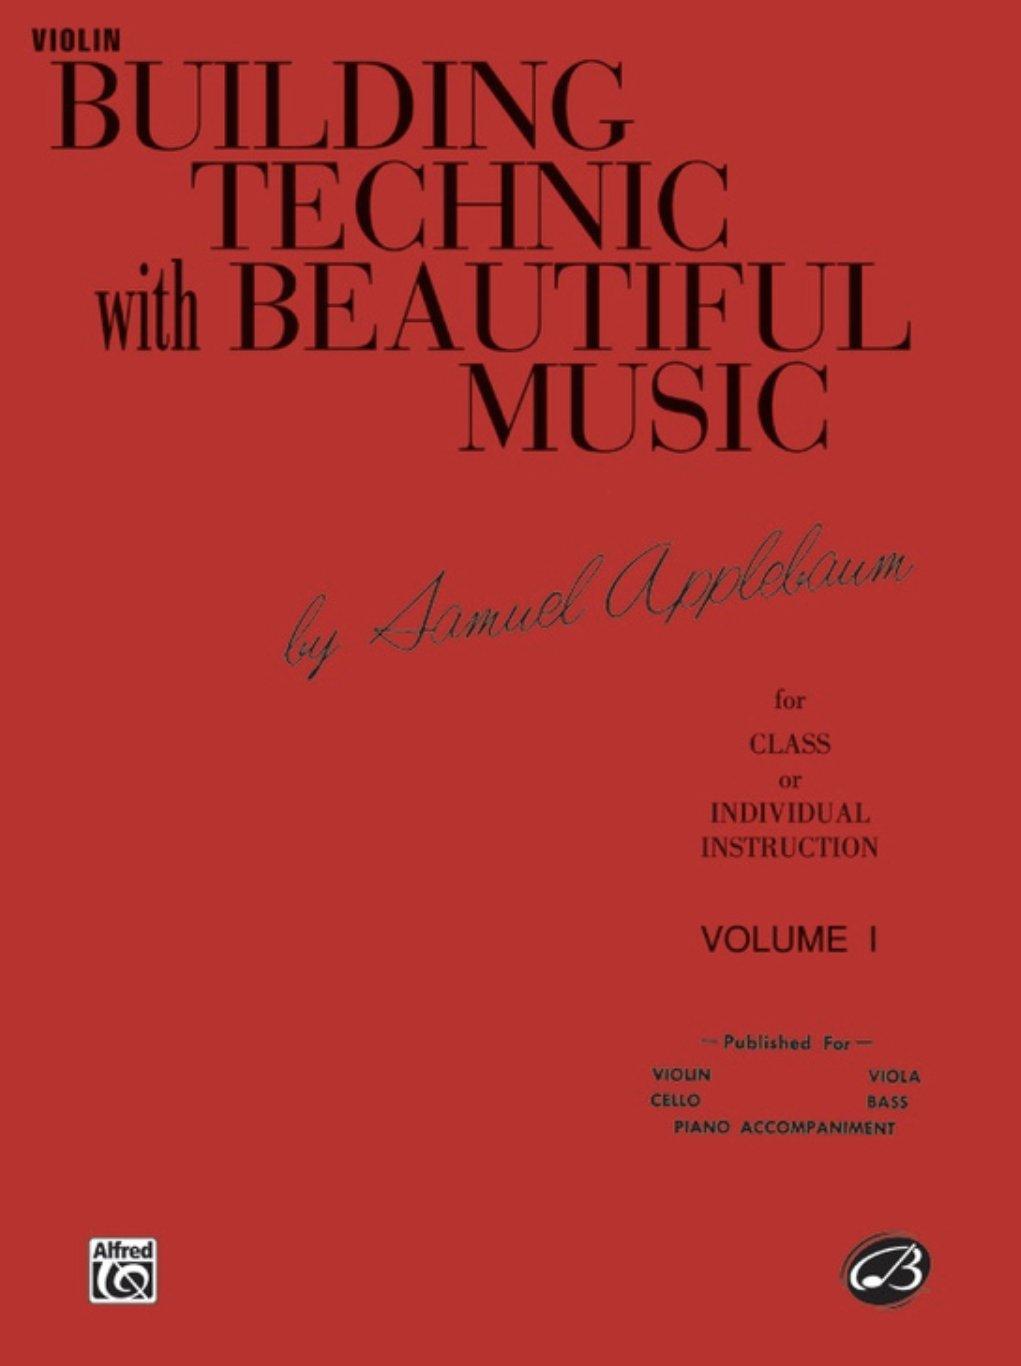 Building Technic with Beautiful Music Vol 1 - Applebaum - Violin - Belwin